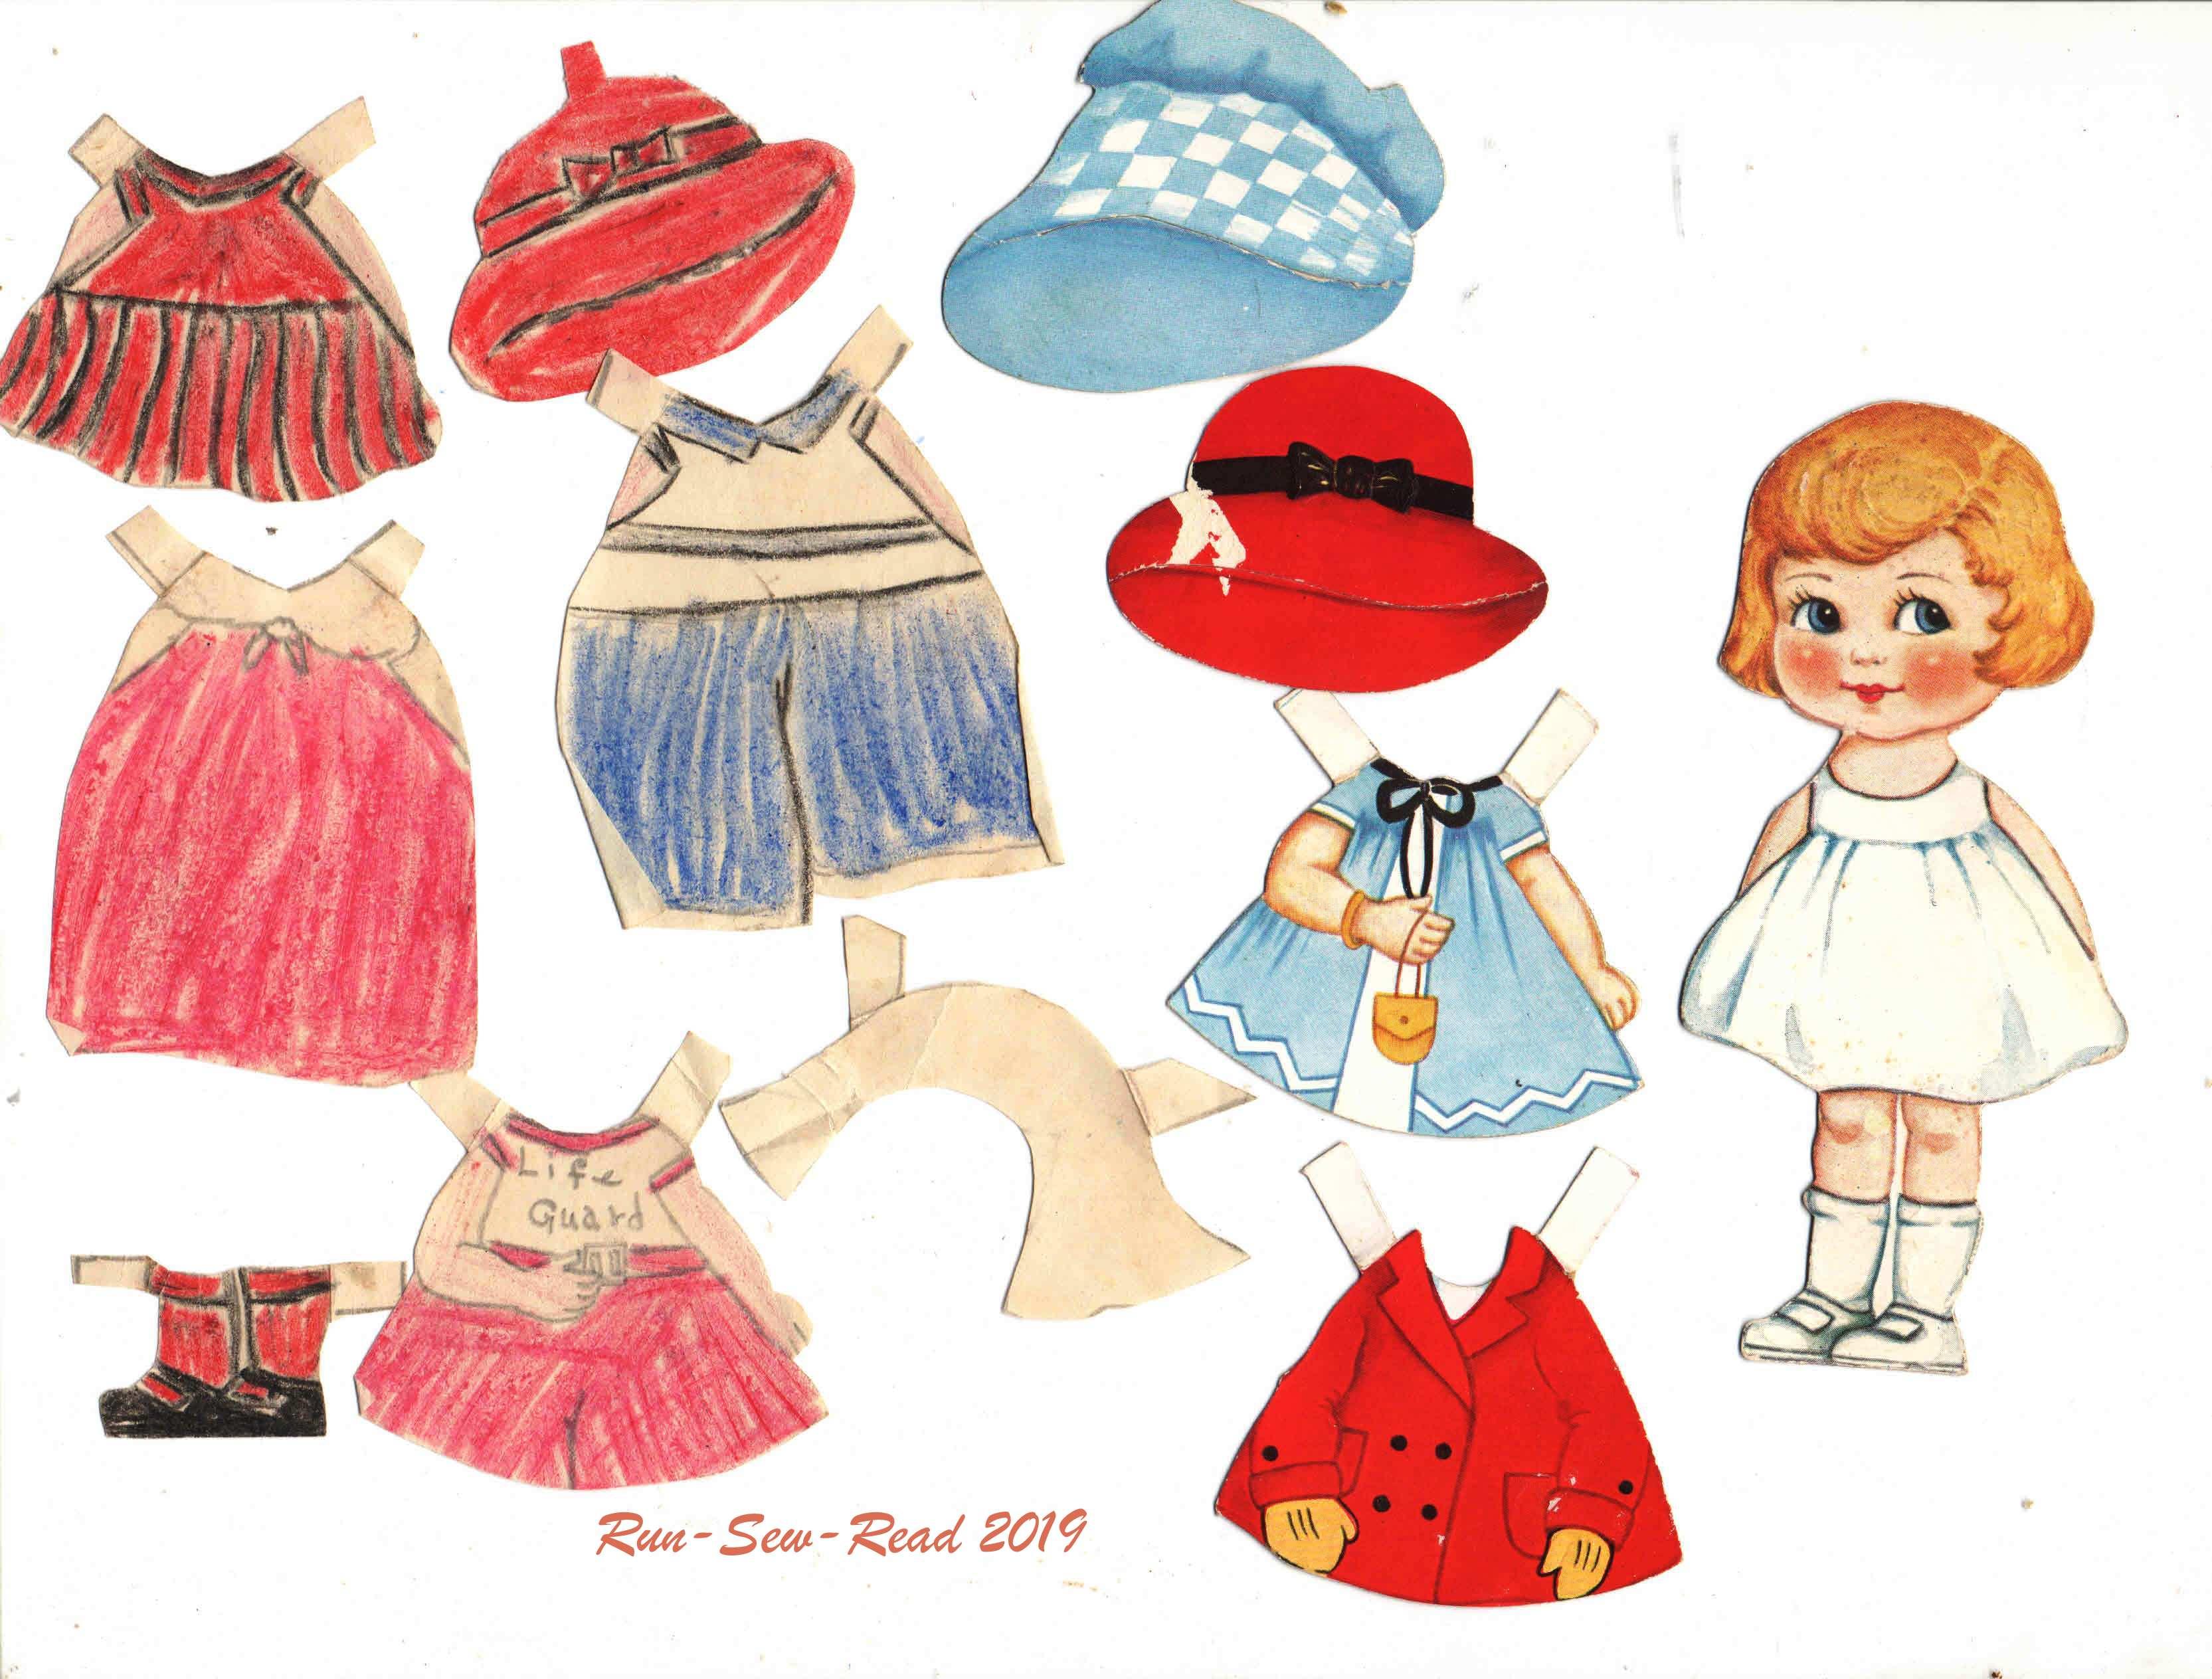 Grandmas paper doll valentine 1920s-Mary3 RSR